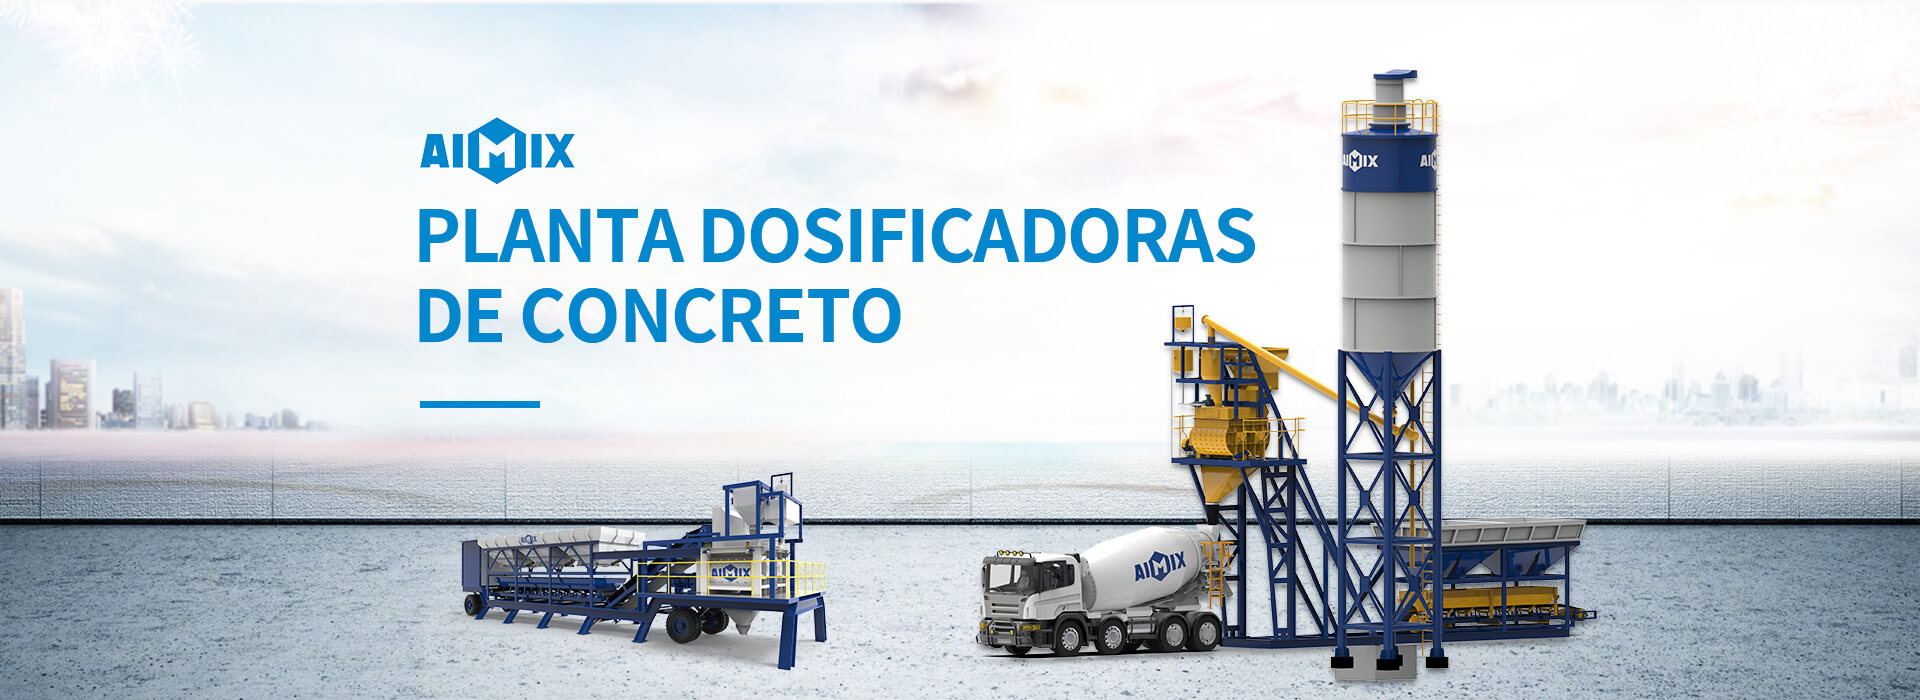 Venta De AIMIX Planta De Concreto